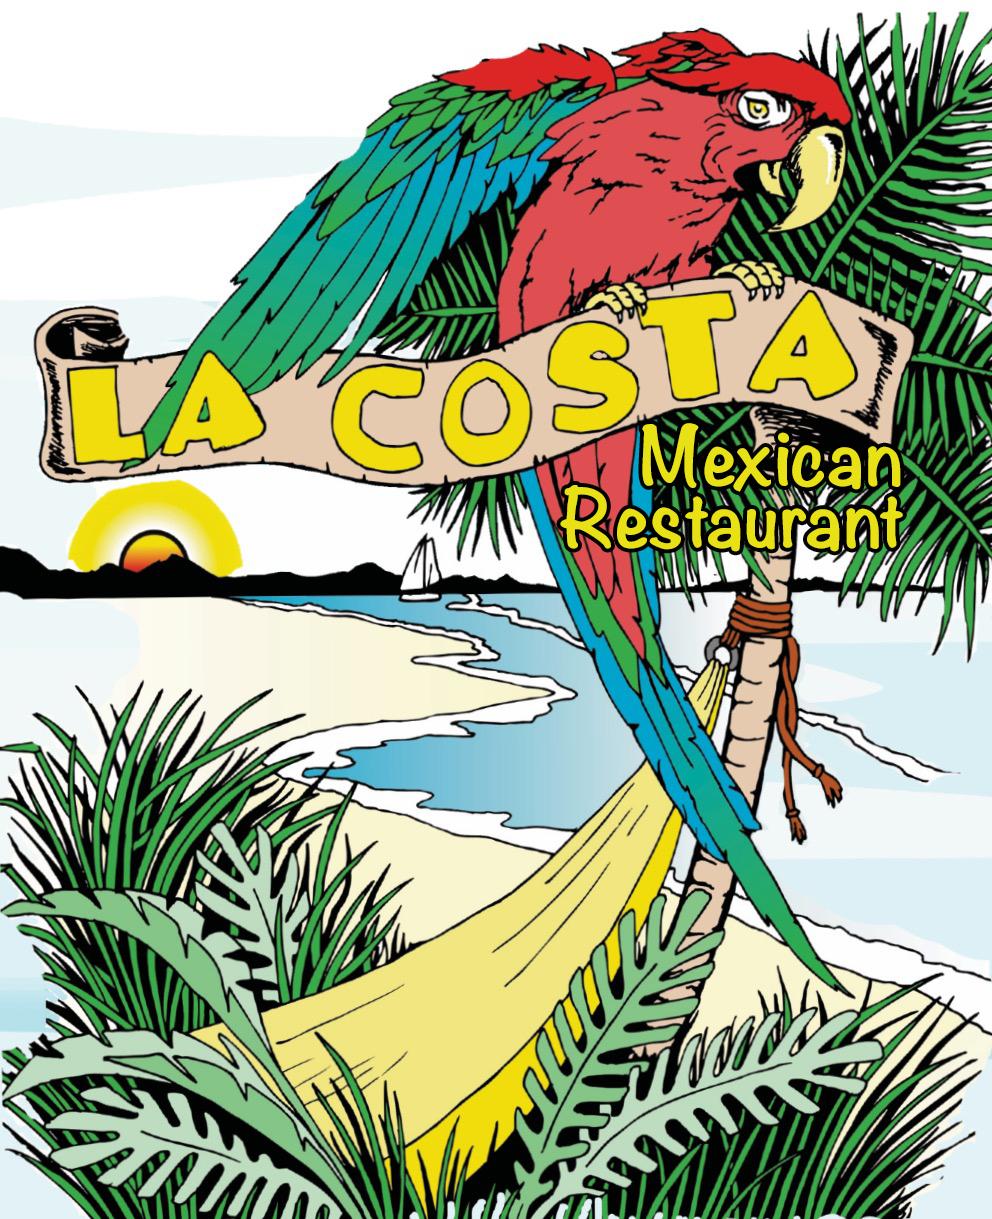 La Costa Mexican Restaurant Wilmington Nc